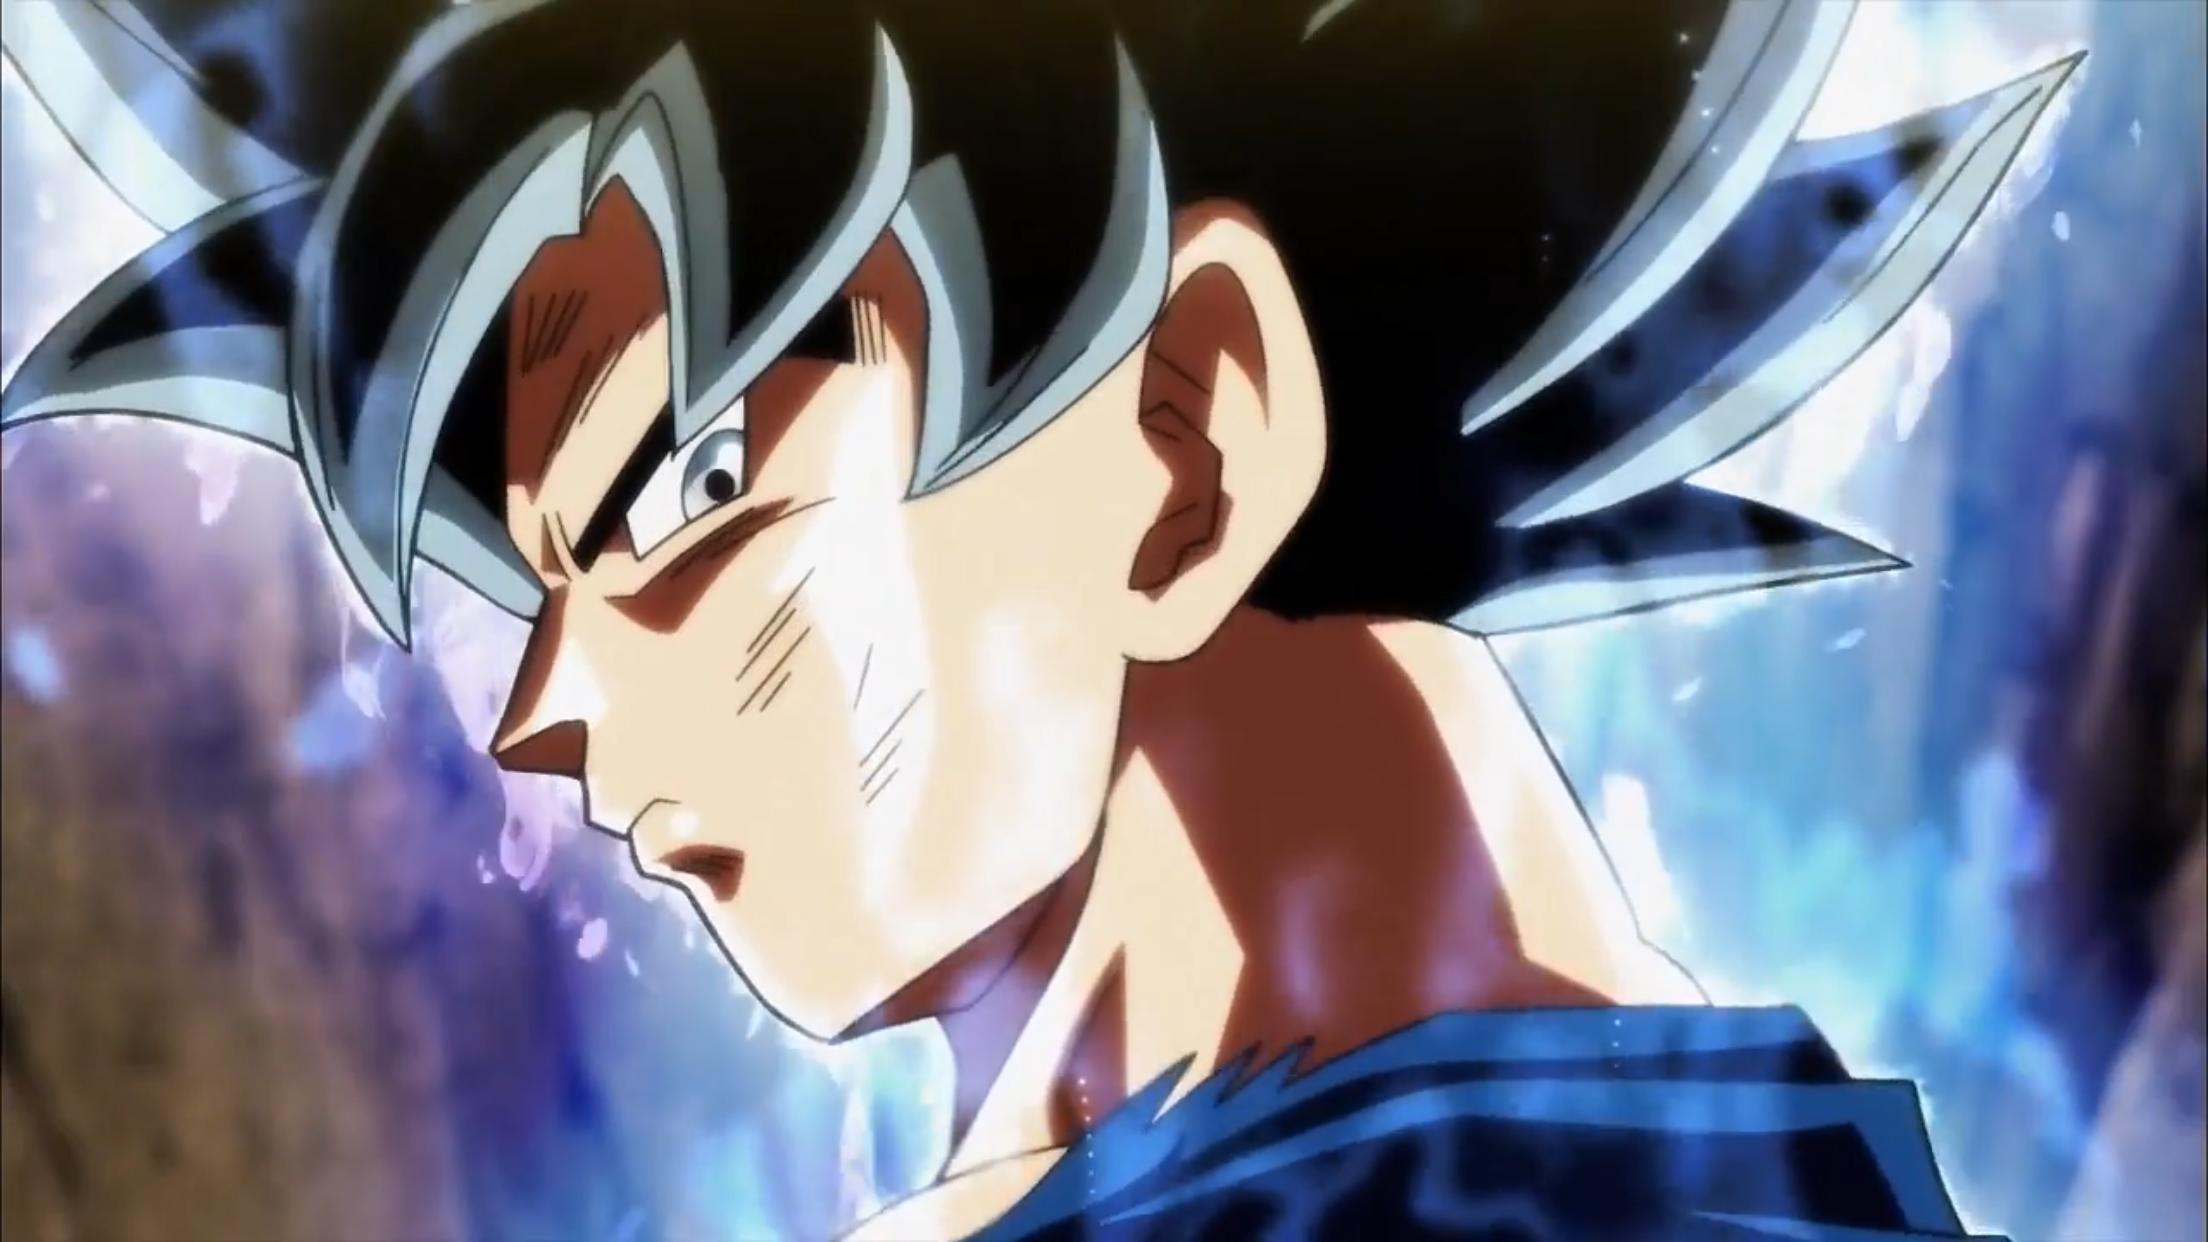 Goku Ultra Instinct Dbs Ep 110 Goku Ultra Instinct Anime Running Goku